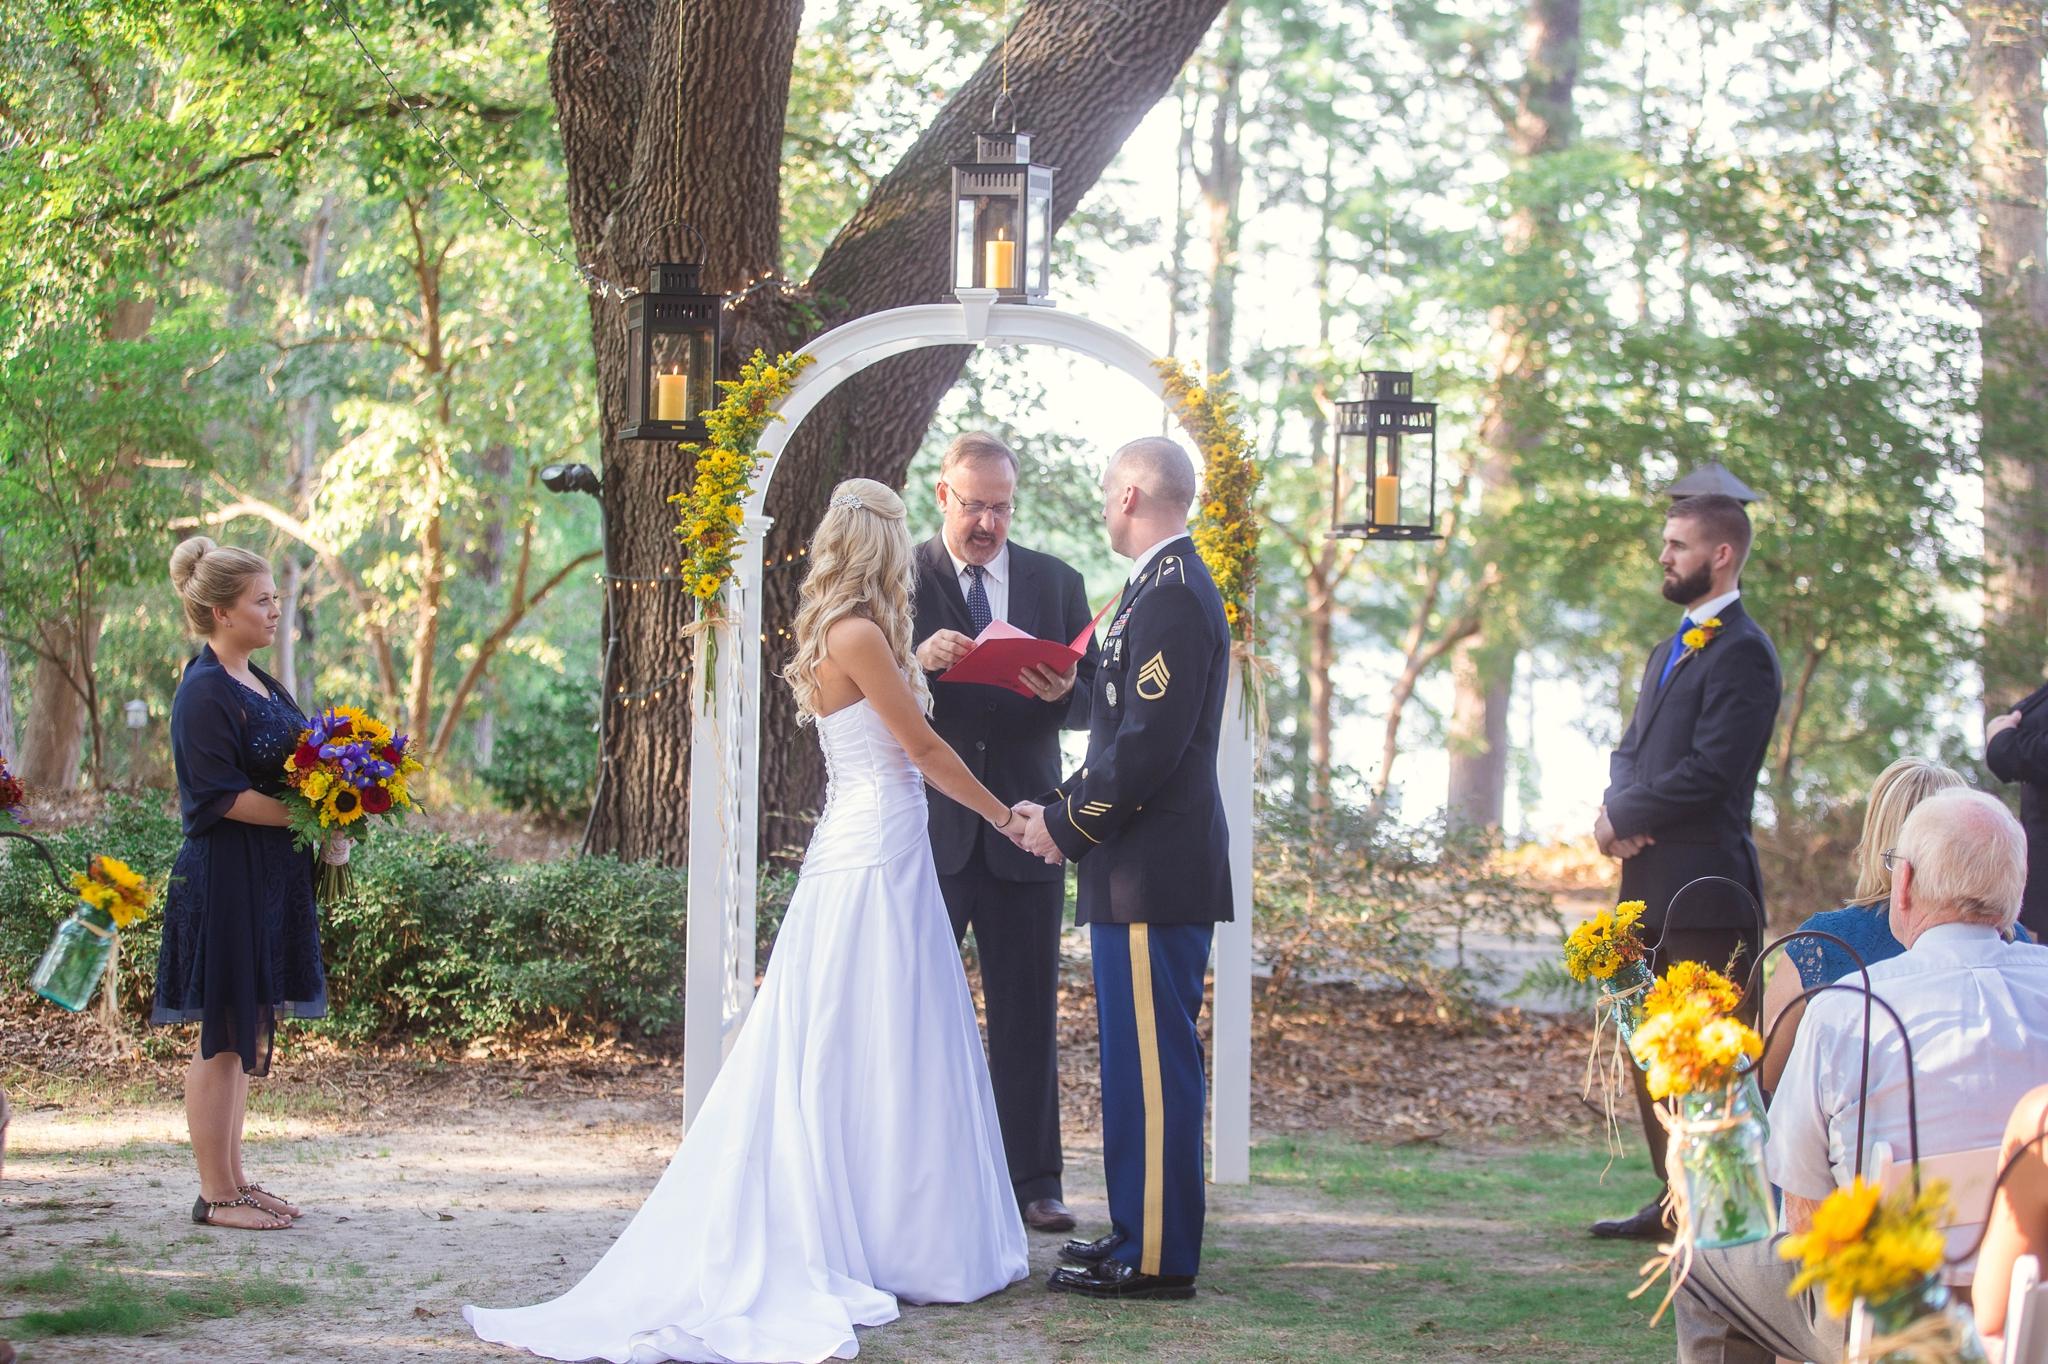 Wedding Ceremony at King Fisher Society by Laurinburg, North Carolina